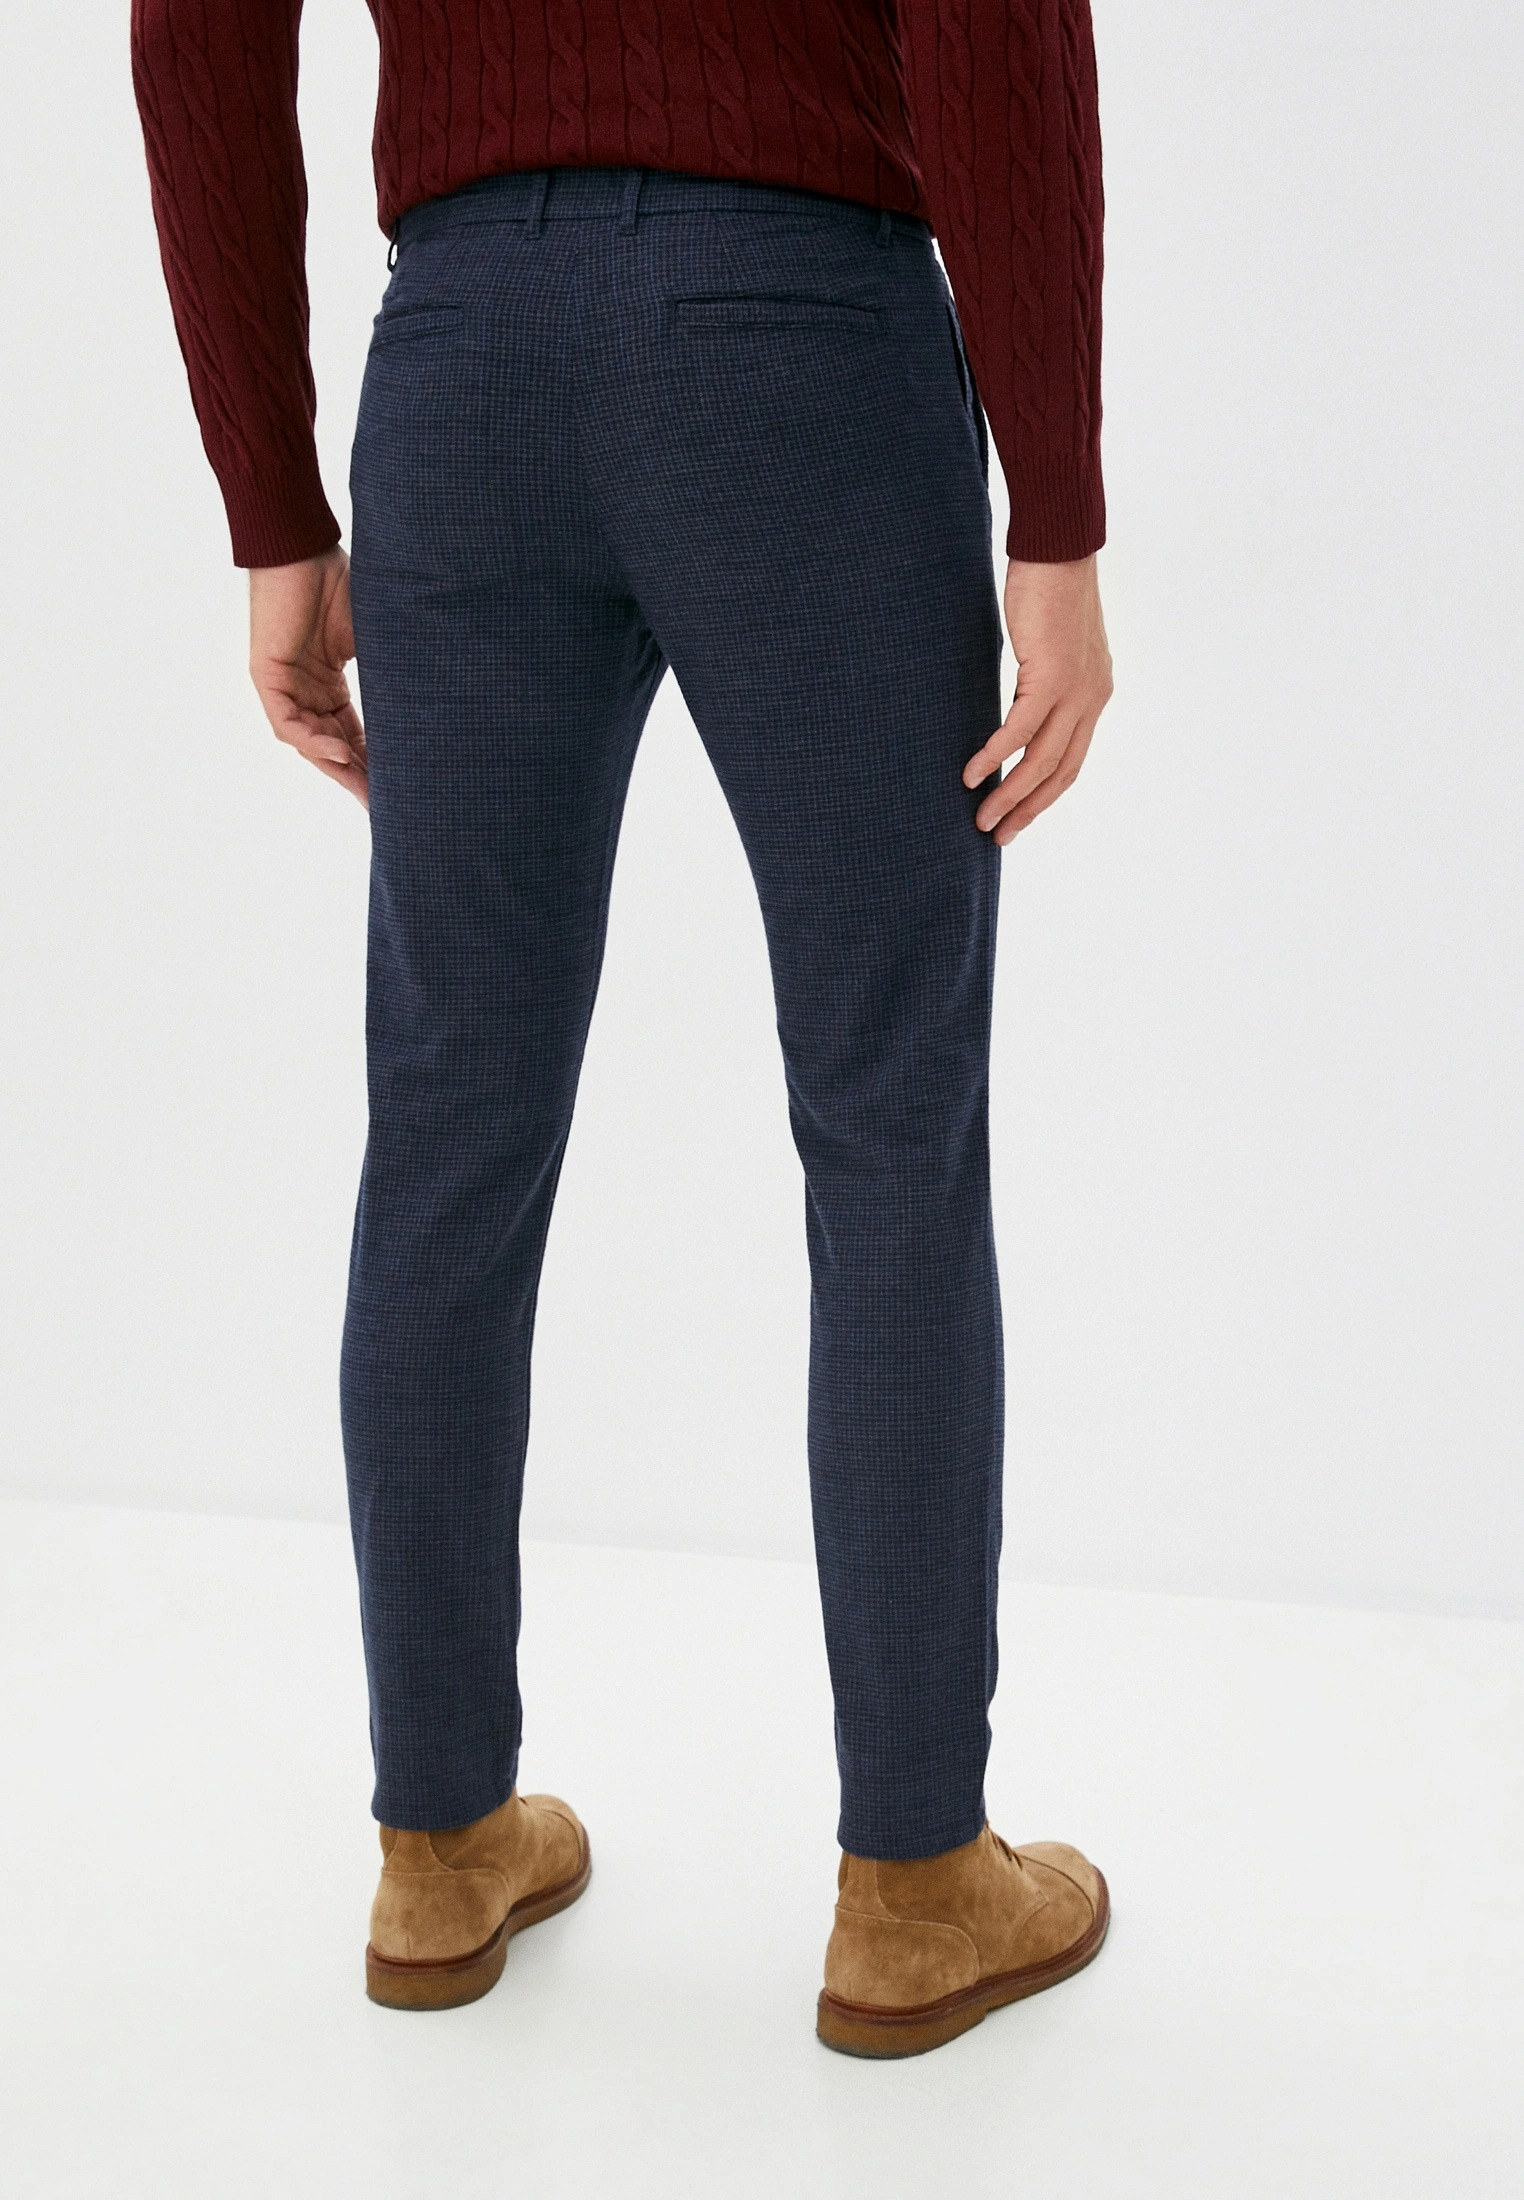 Pantaloni Selected Casual (4585) photo 0